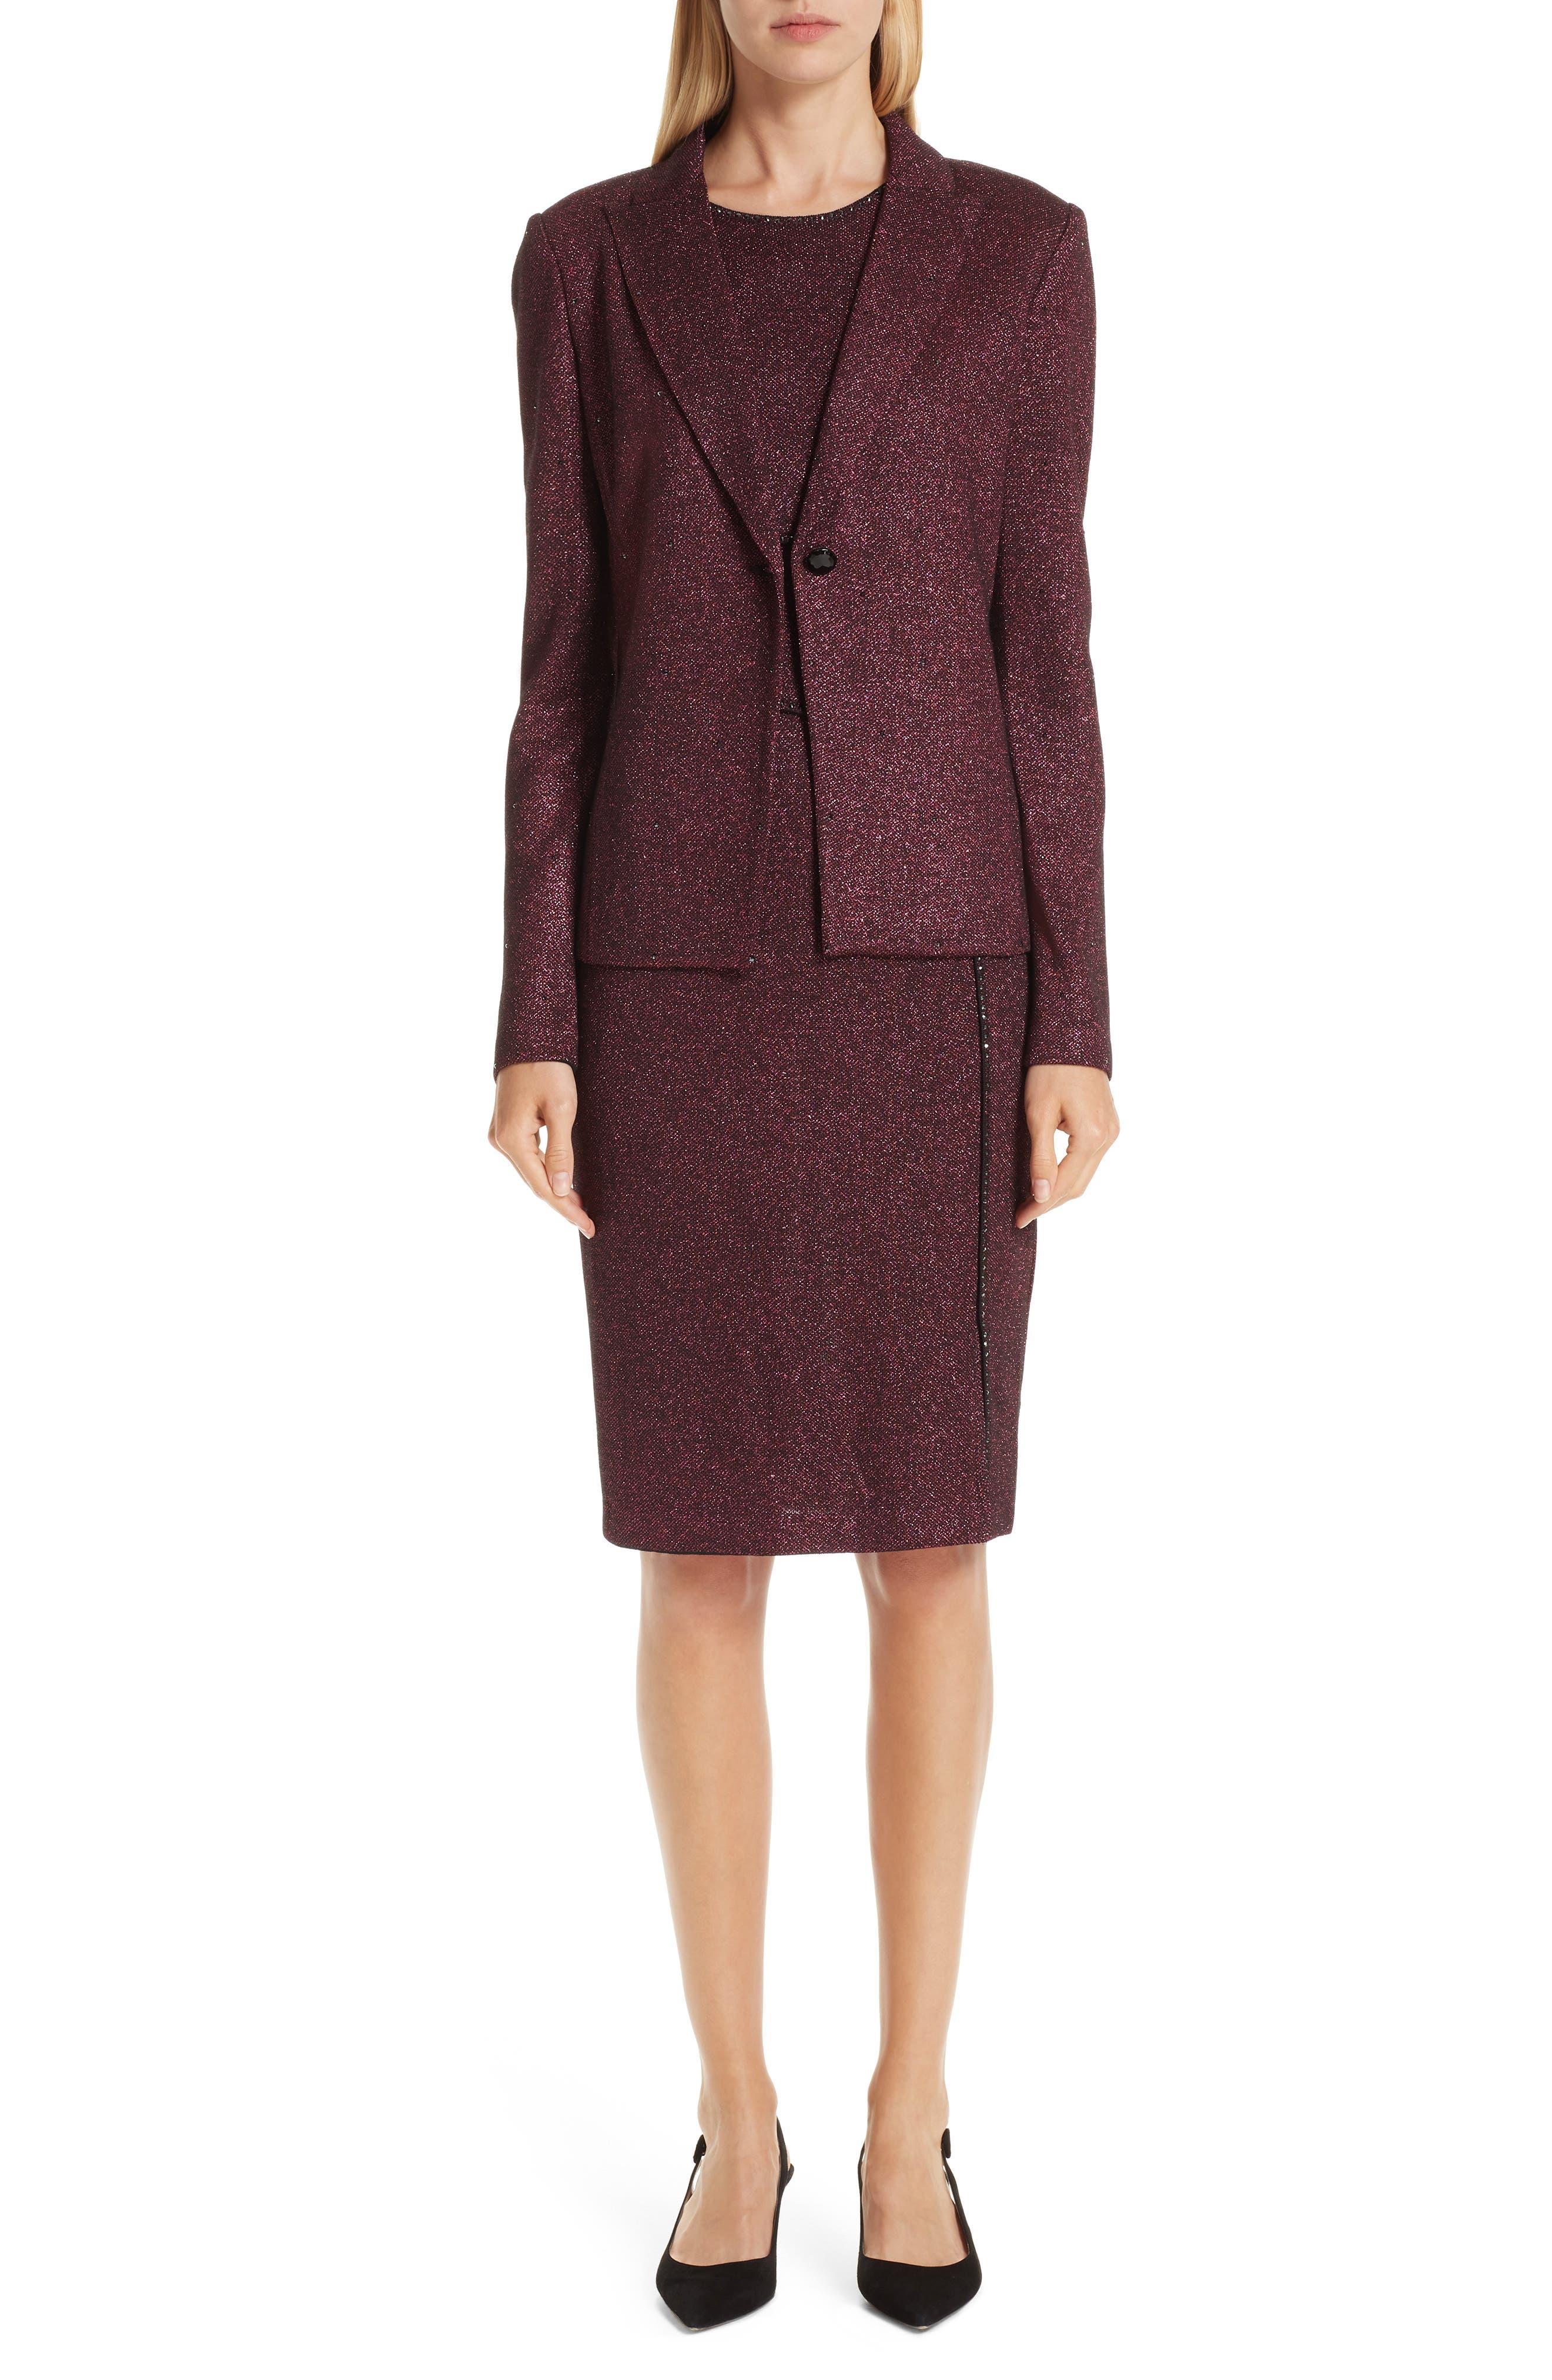 ST. JOHN COLLECTION, Mod Metallic Knit Sheath Dress, Alternate thumbnail 8, color, DARK PINK MULTI